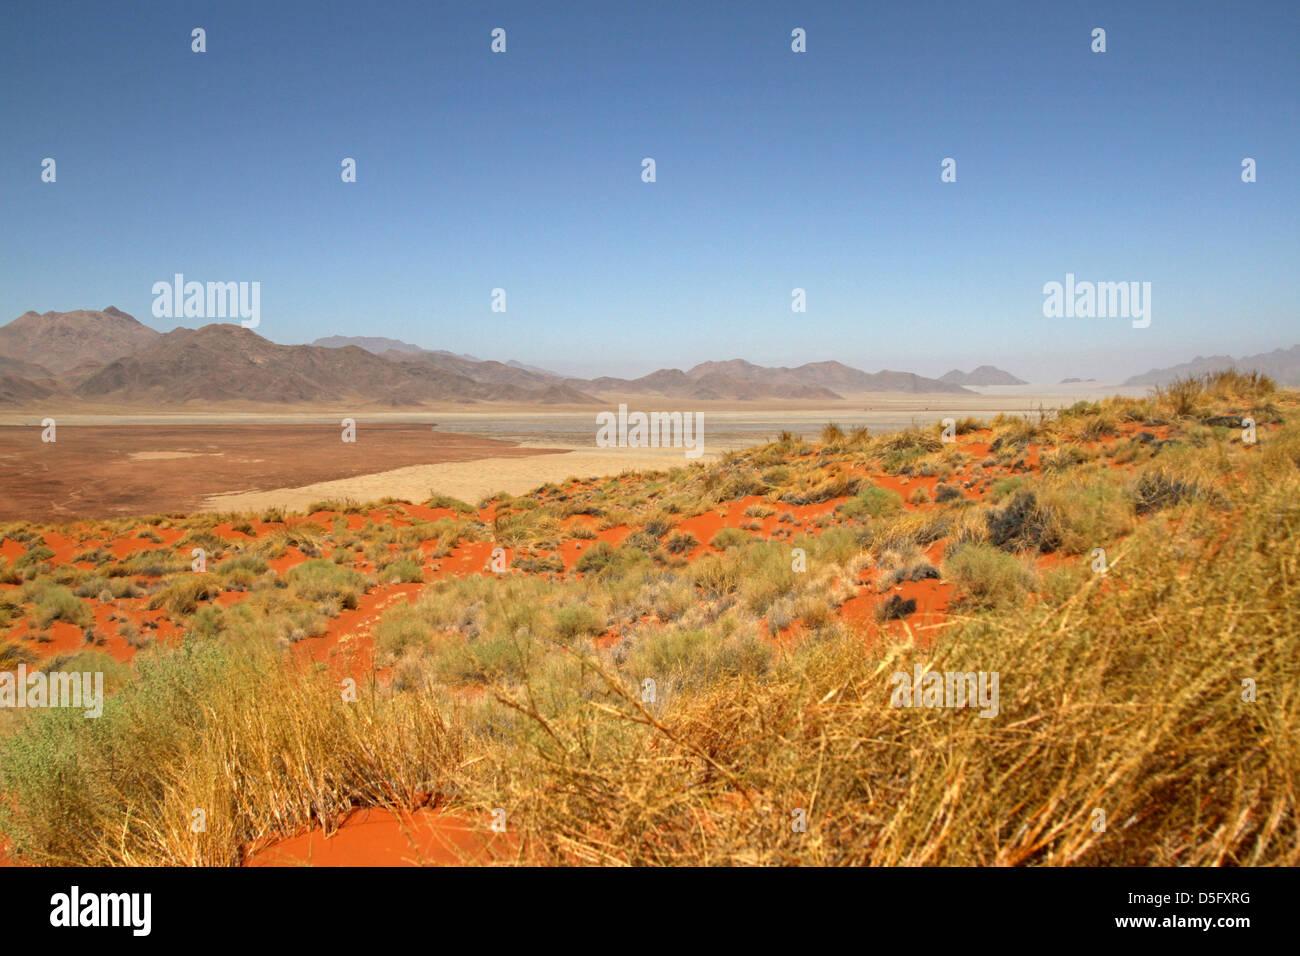 Namibrand Nature Reserve Vista - Stock Image